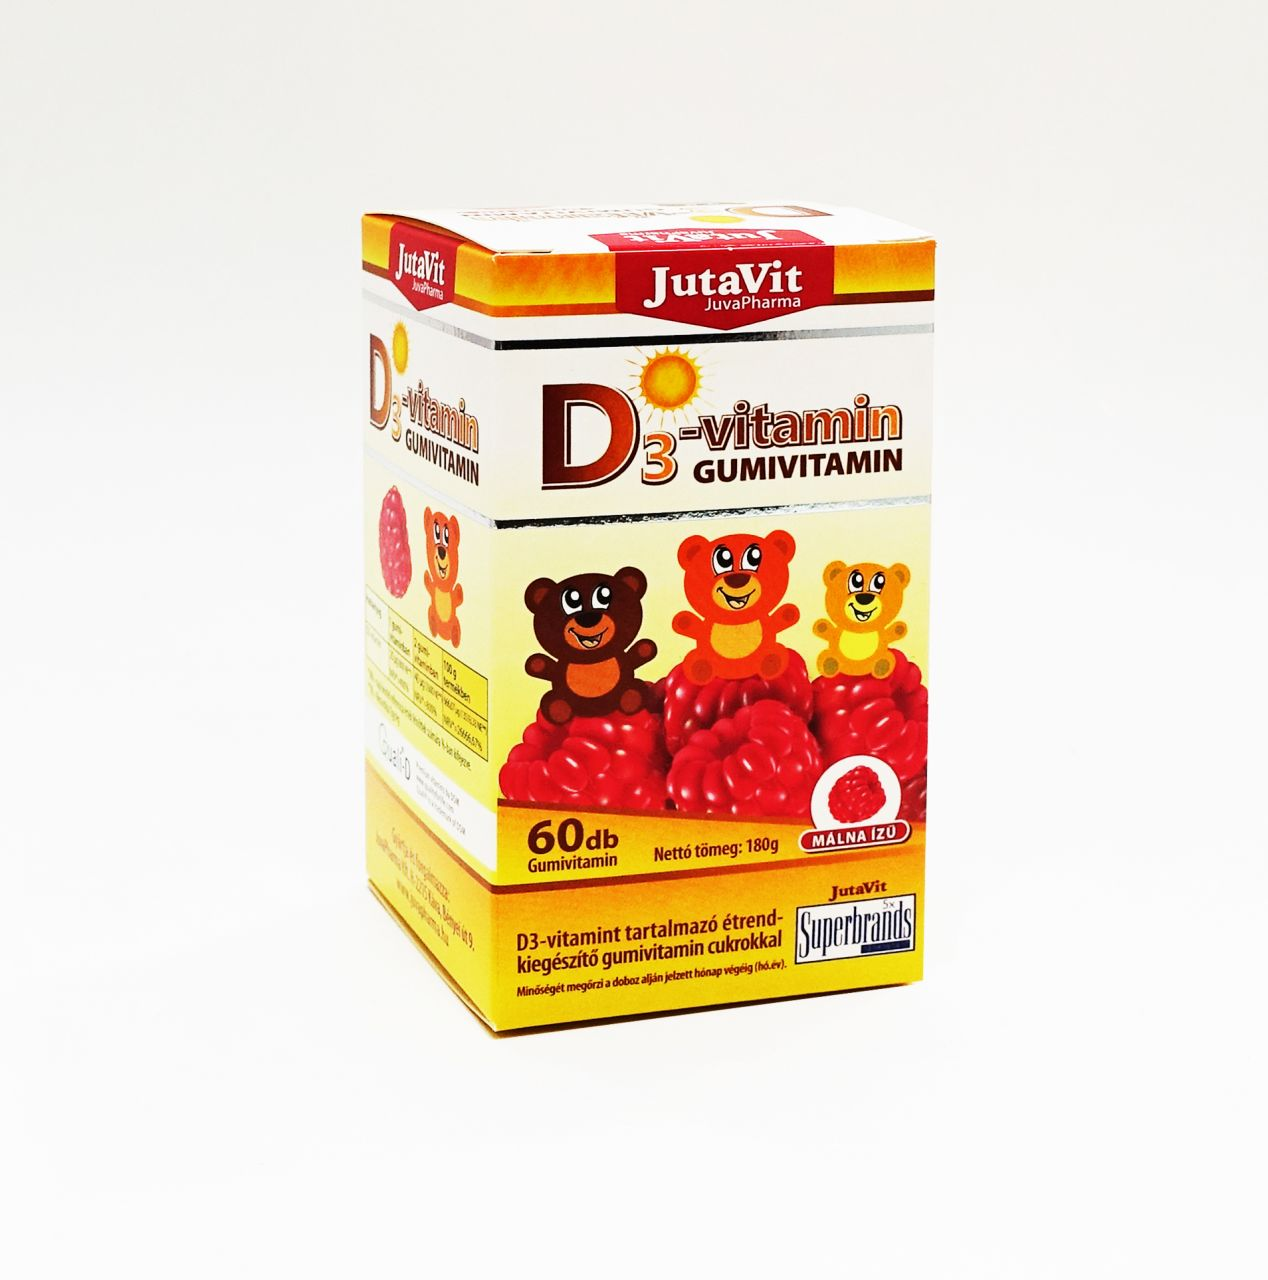 JutaVit D3-vitamin Gumivitamin málna ízű, 60db